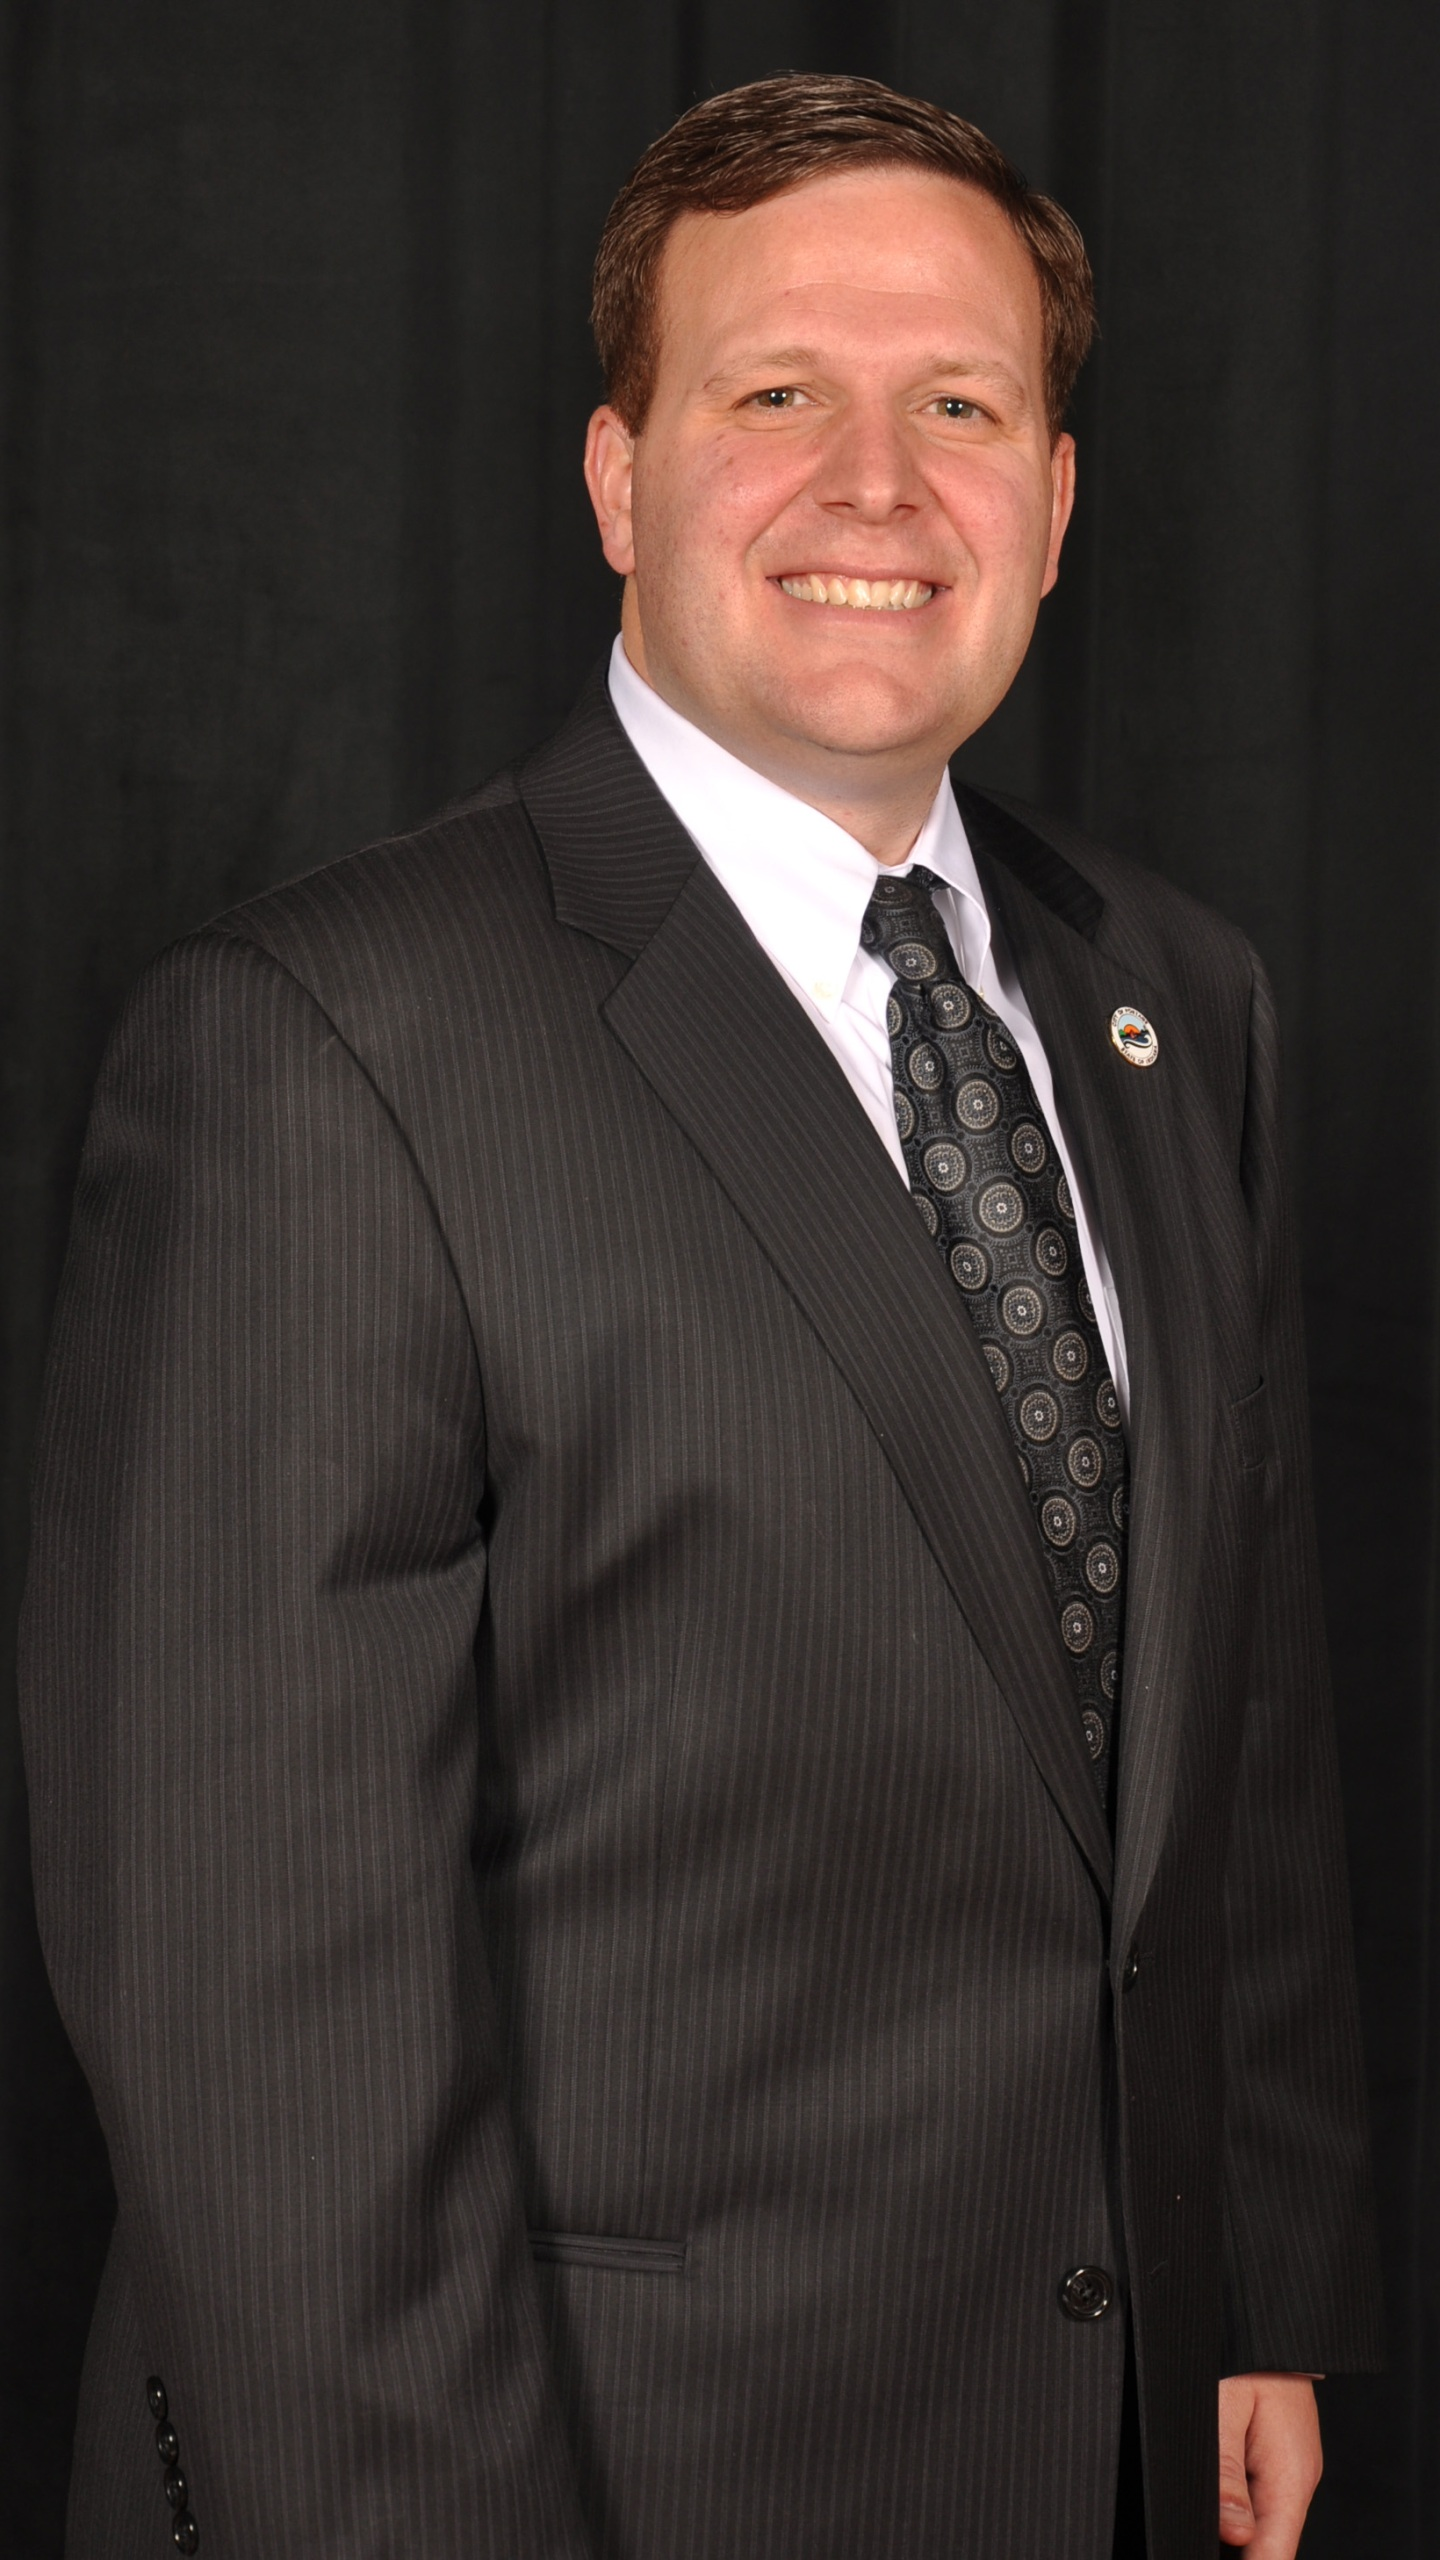 Portage Mayor James Snyder_1523507703631.jpg.jpg